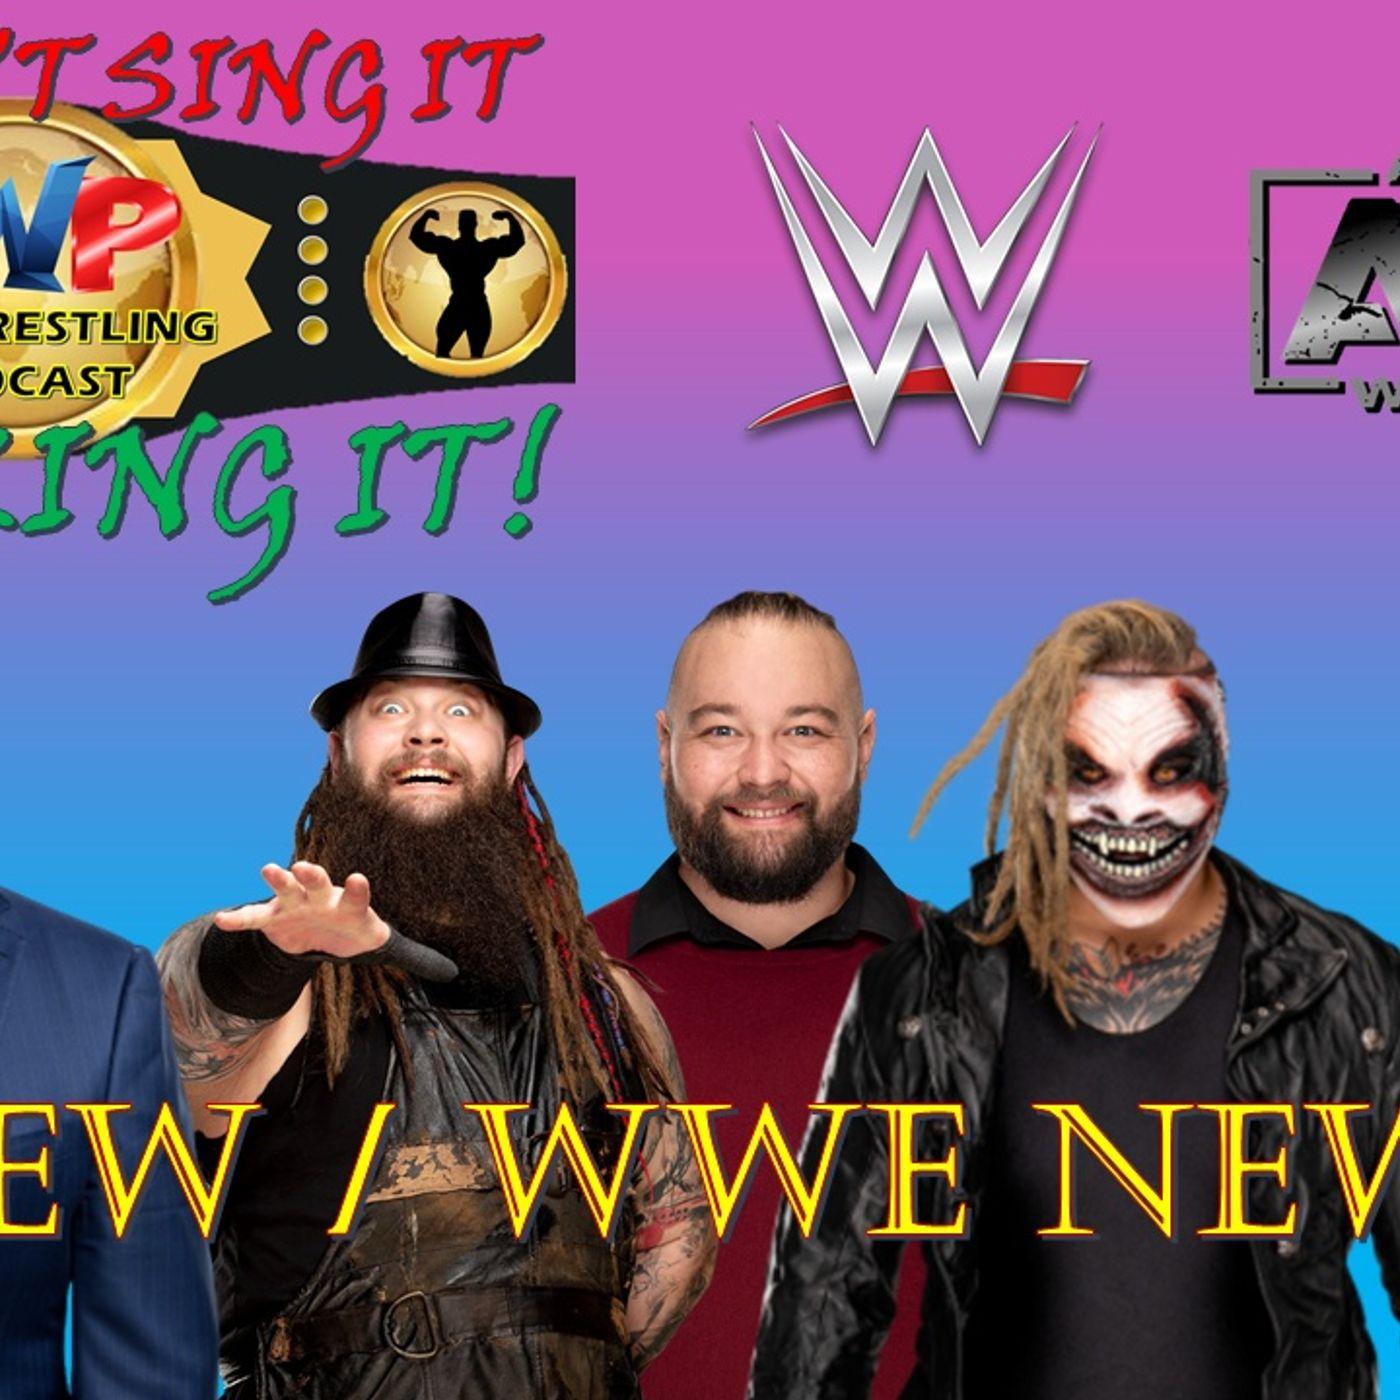 Is Vince McMahon Killing WWE? AEW / WWE News